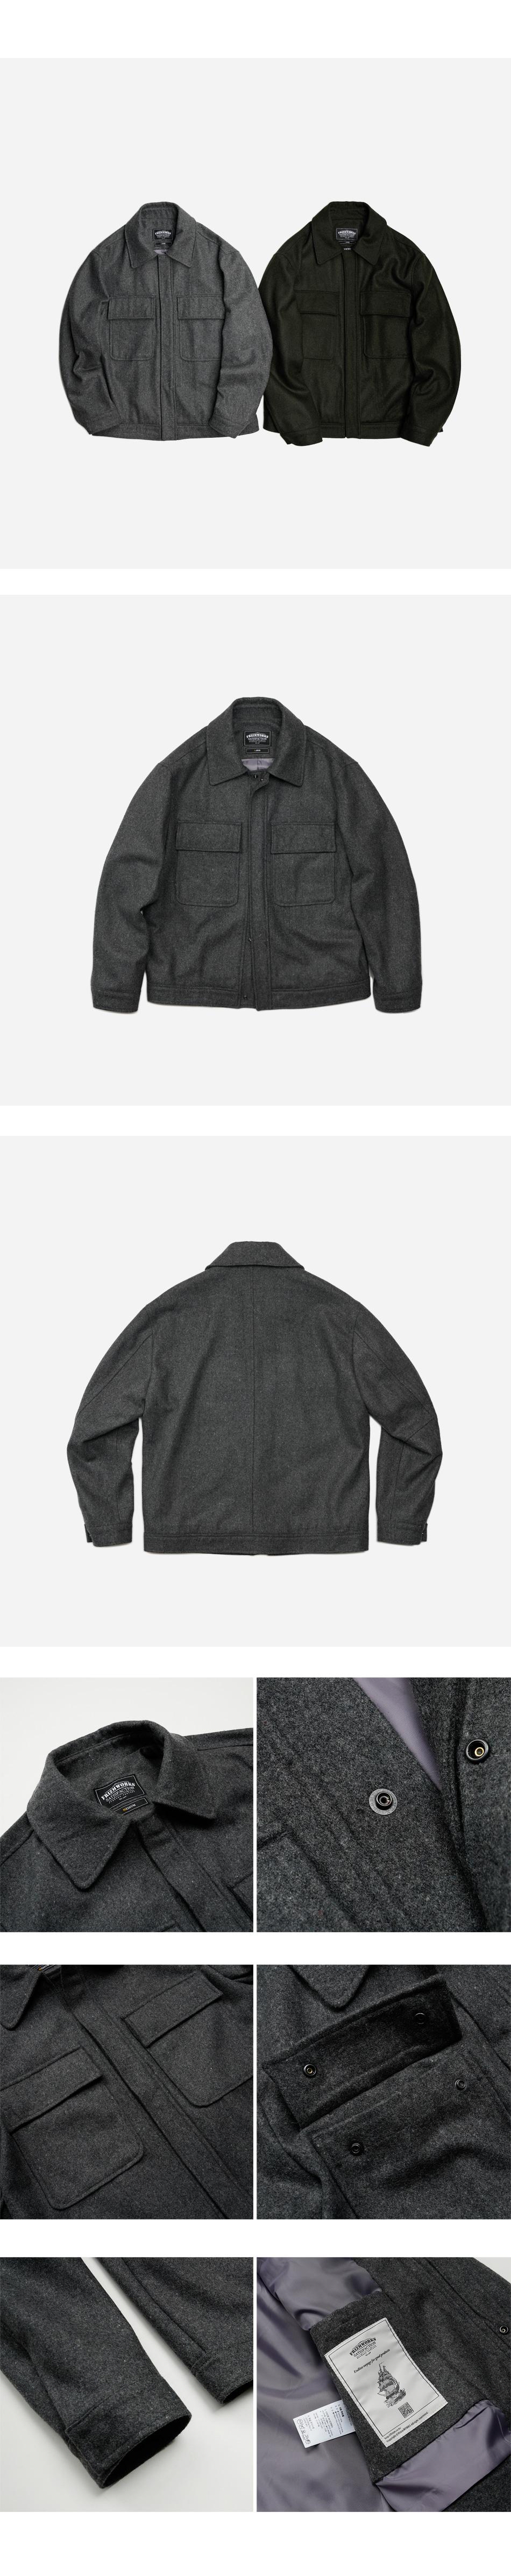 Minimal melton jacket _ charcoal